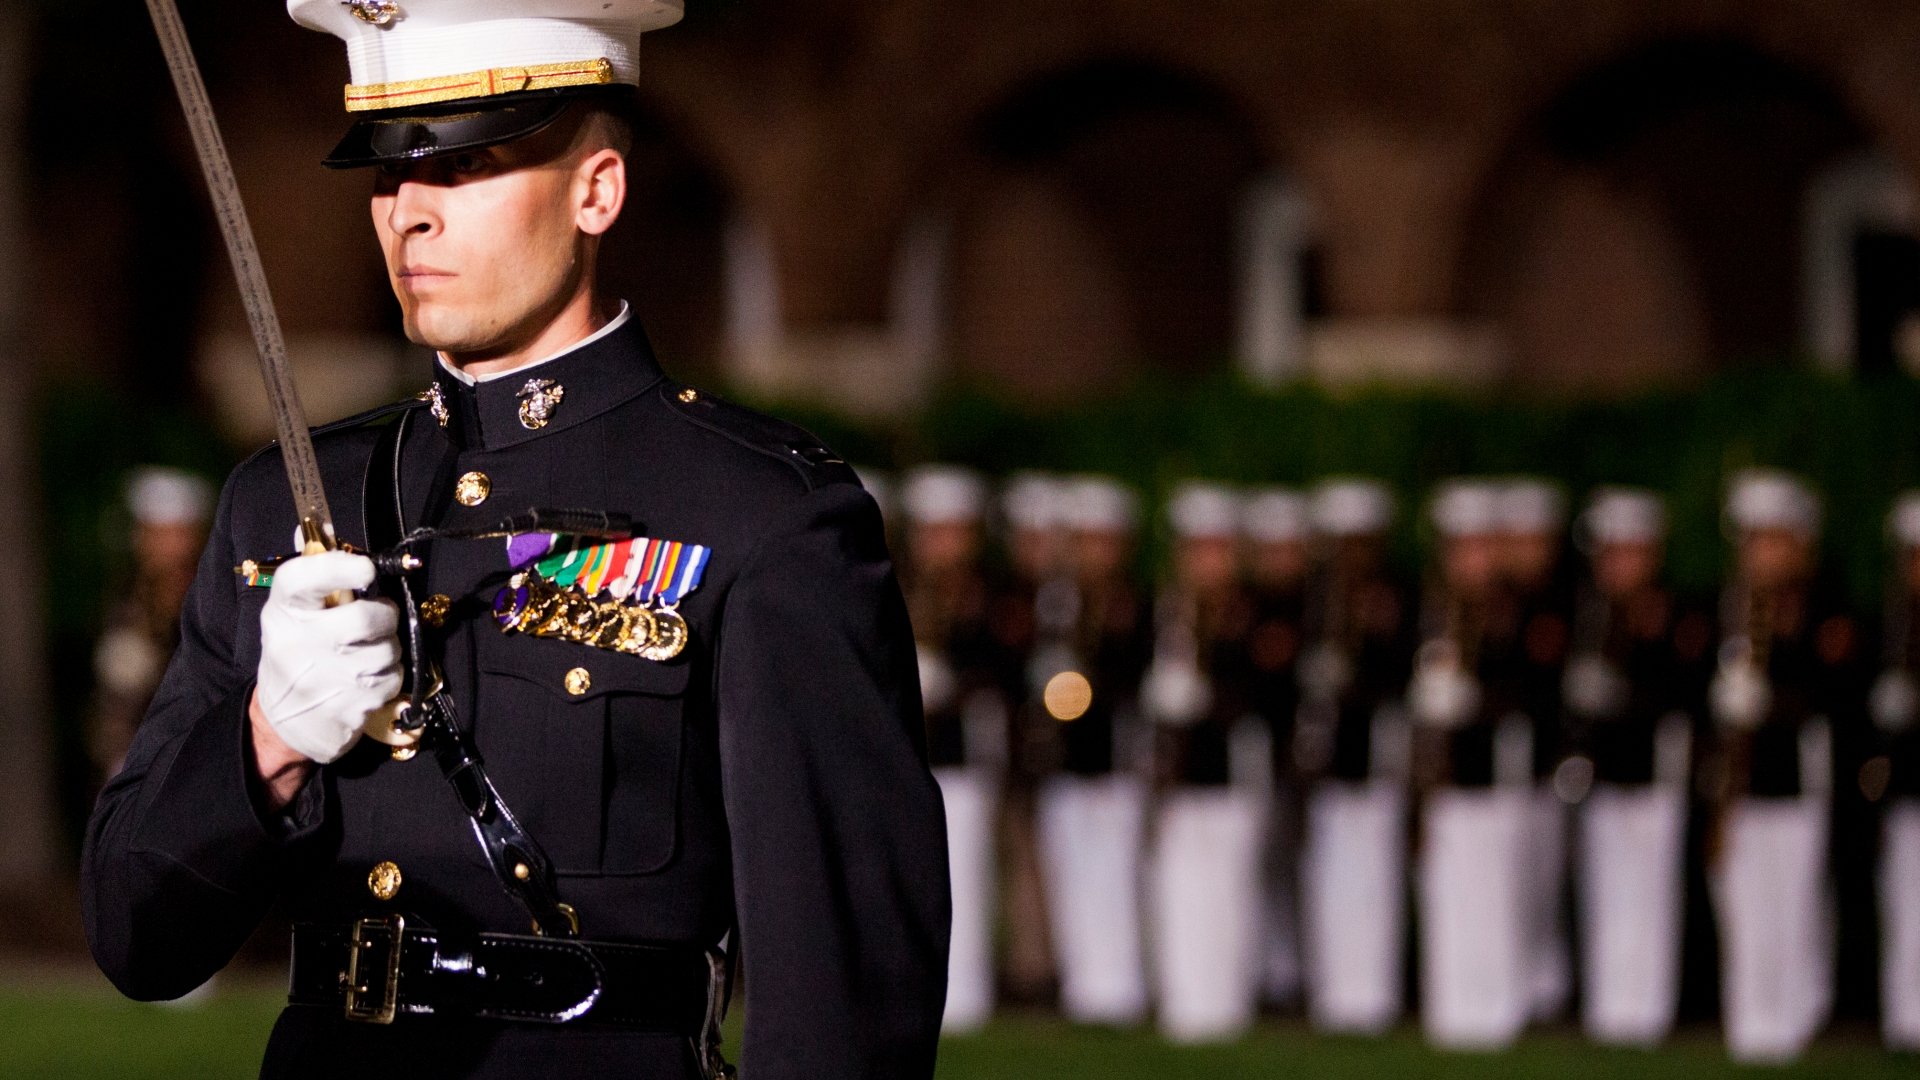 How The Marine Corps Earned Its Mameluke Sword